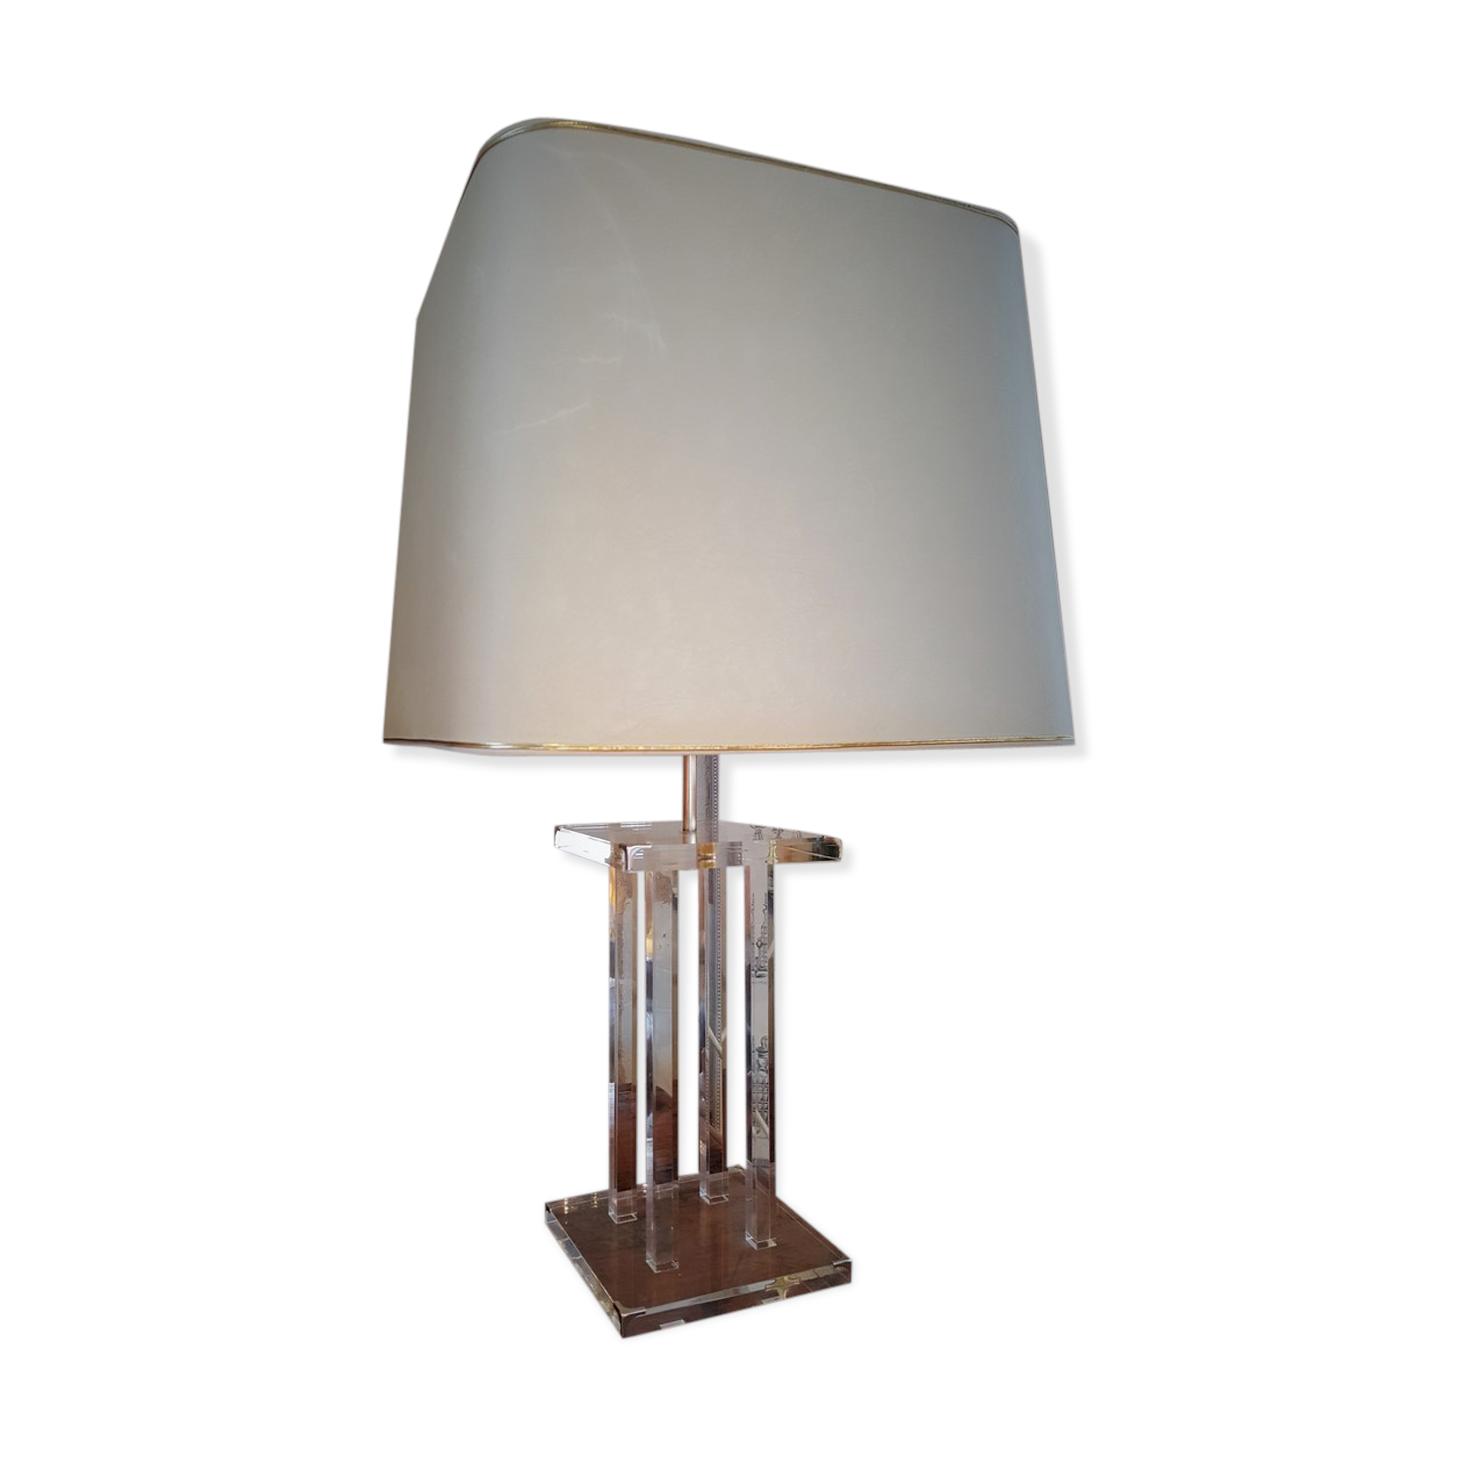 Lampe En Plexiglass Roche Bobois Années 70 - Plexiglas